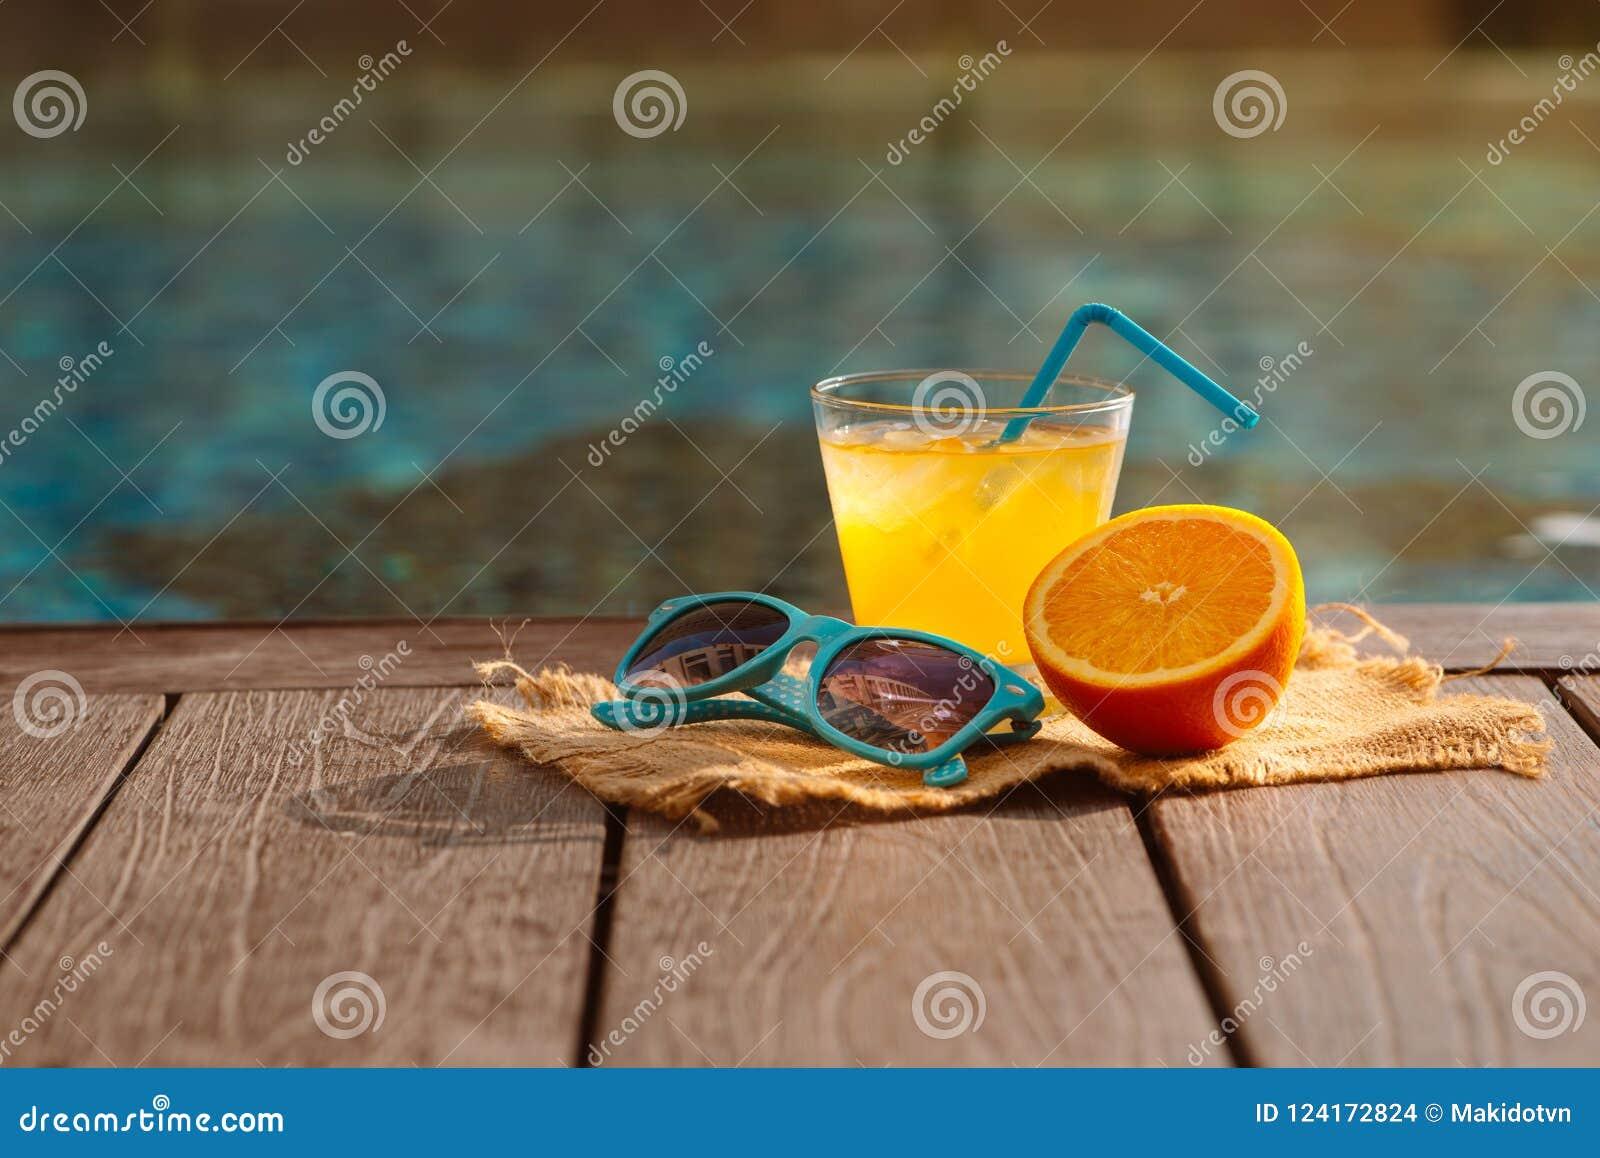 Oranje verse sap smoothie drank, zonnebril dichtbij zwembad